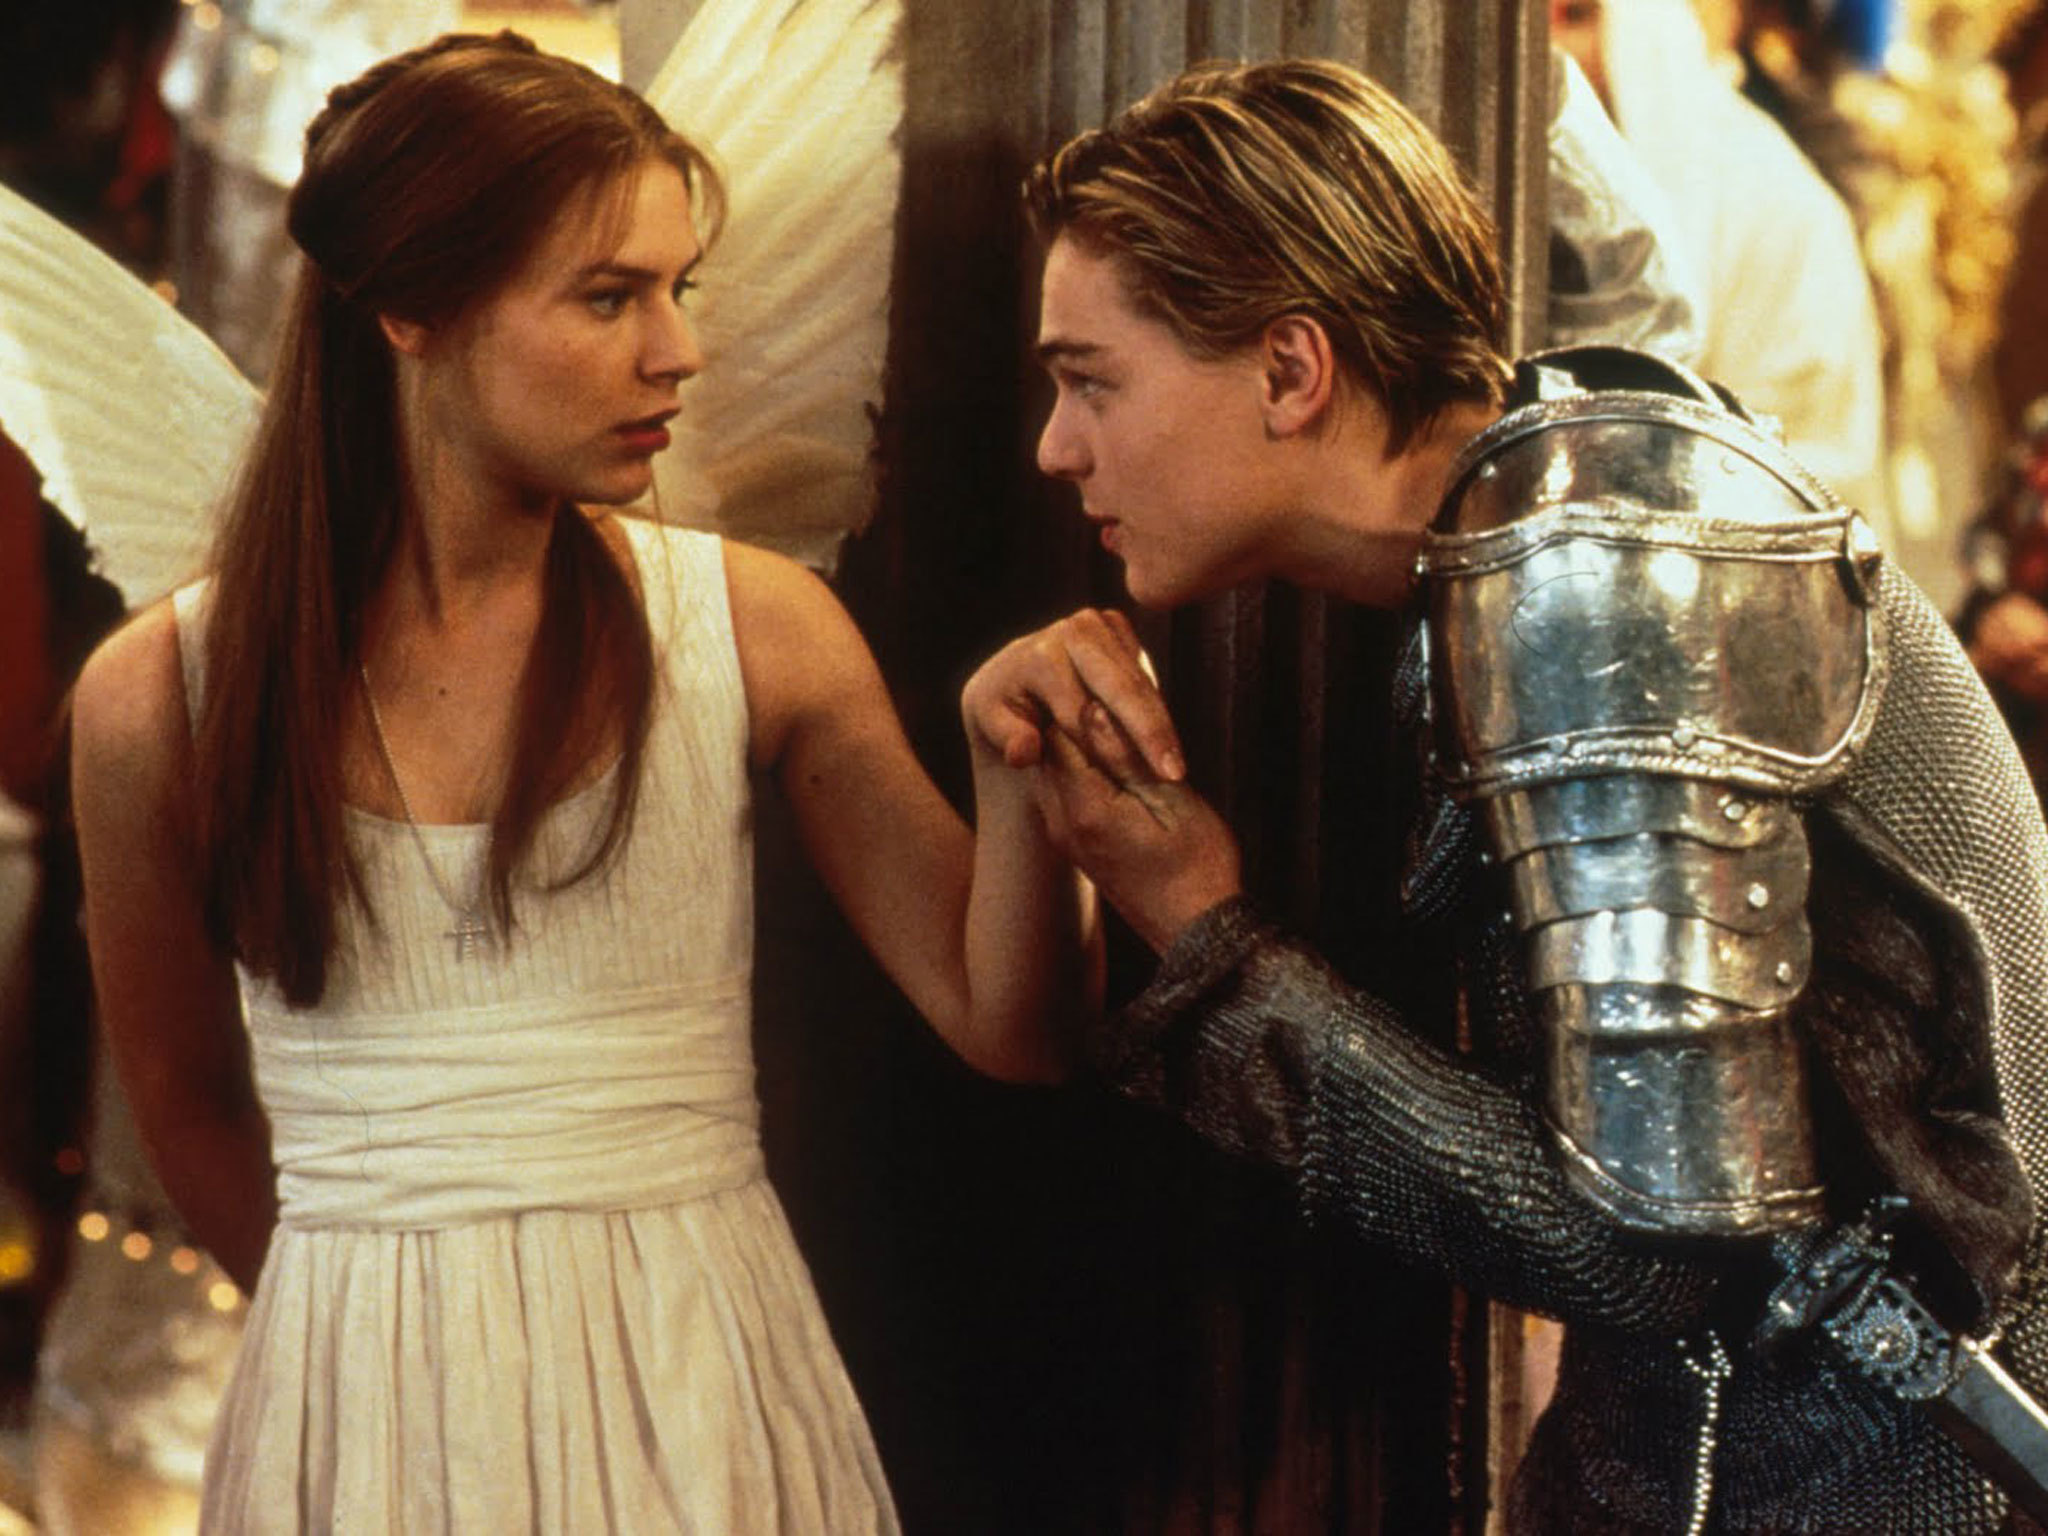 William Shakespeare's Romeo + Juliet (1996)